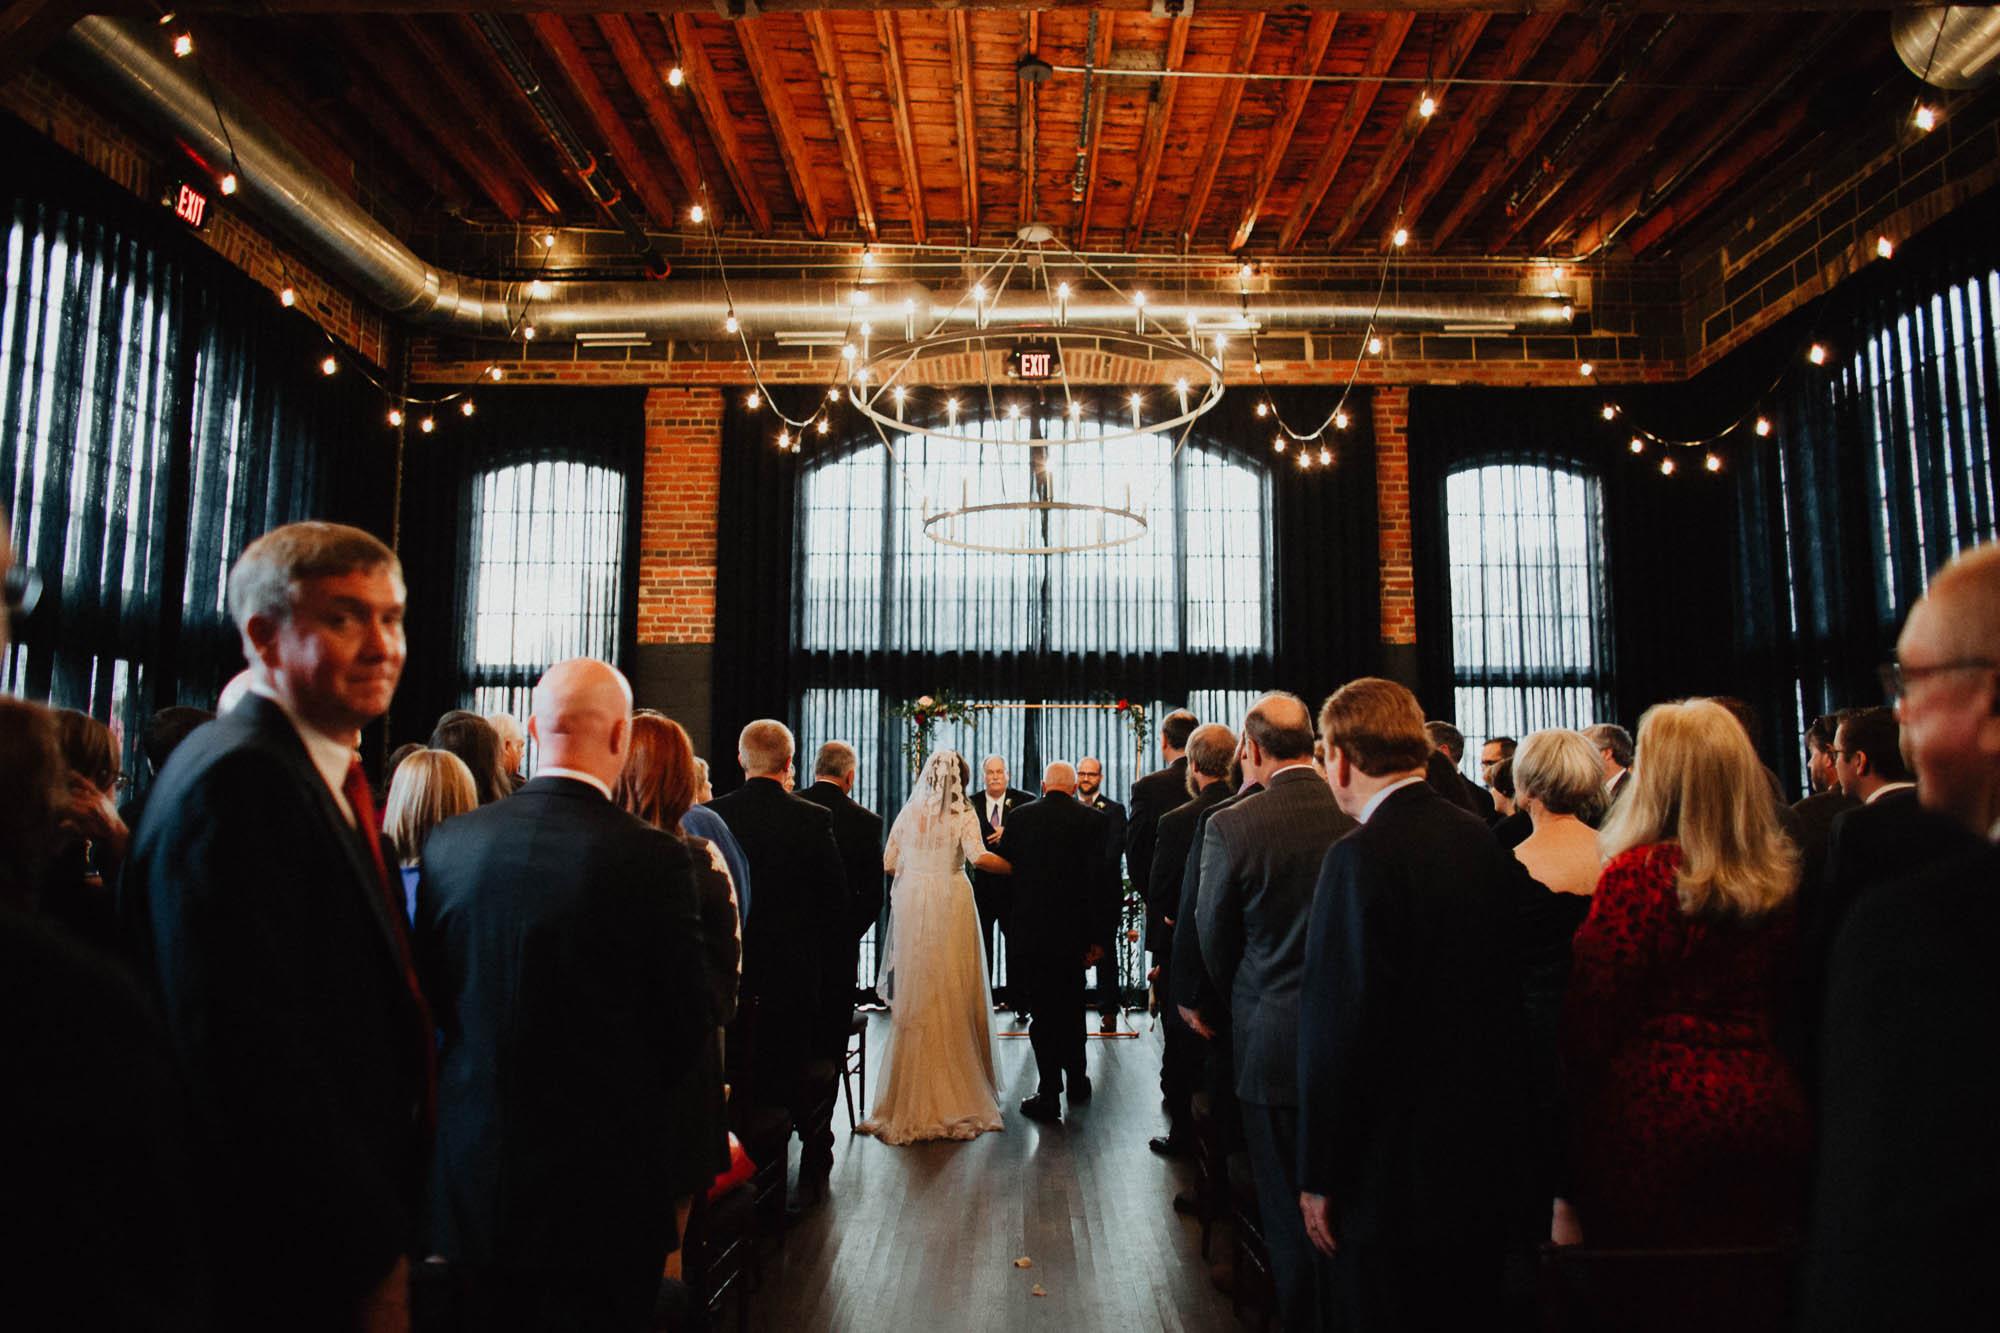 Highline-Car-House-Wedding-Columbus-Kristin-Aaron-073.jpg